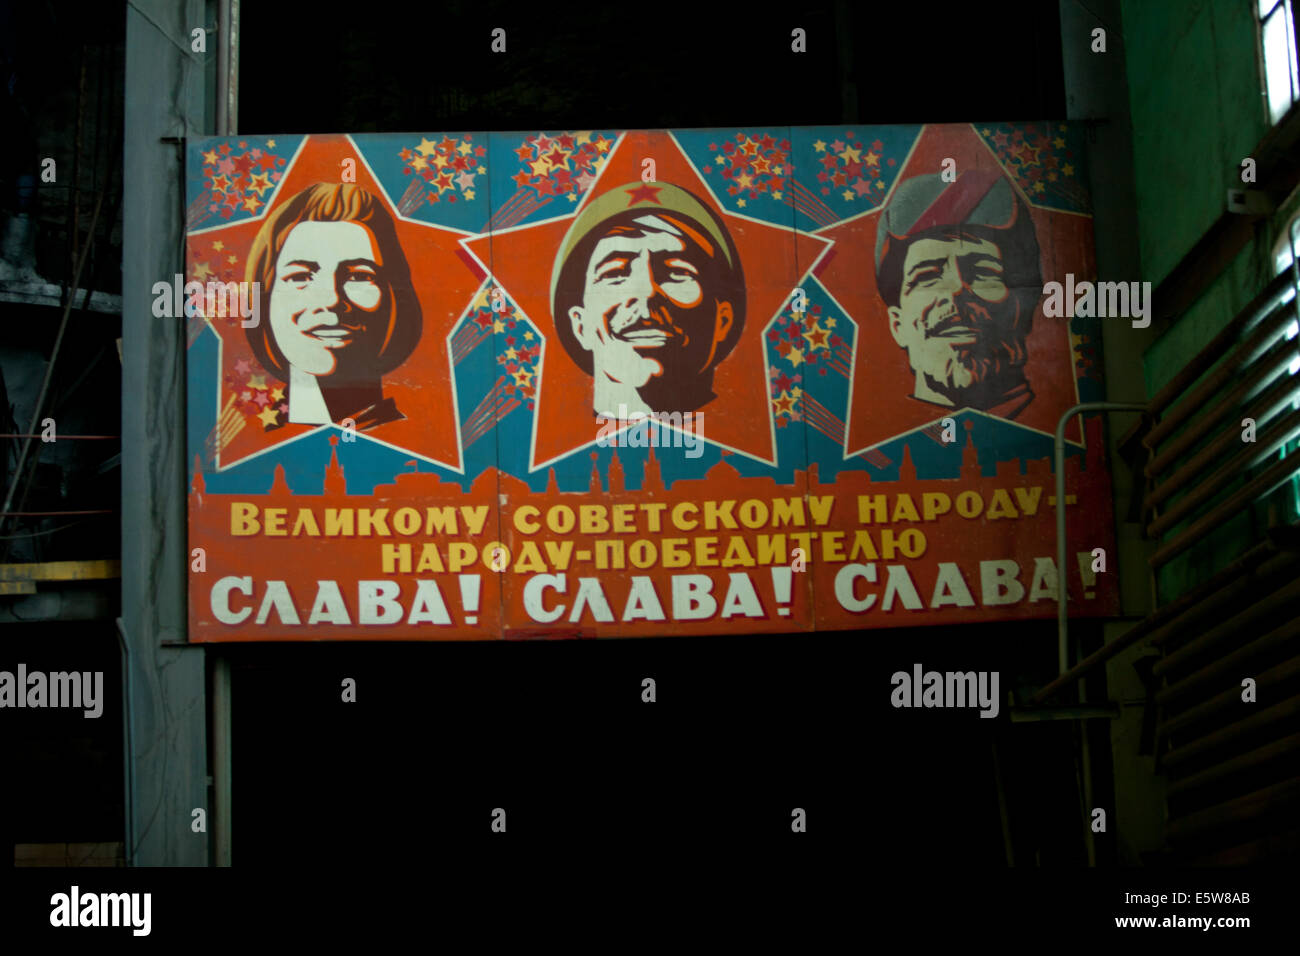 Russian propaganda communist poster art - Stock Image